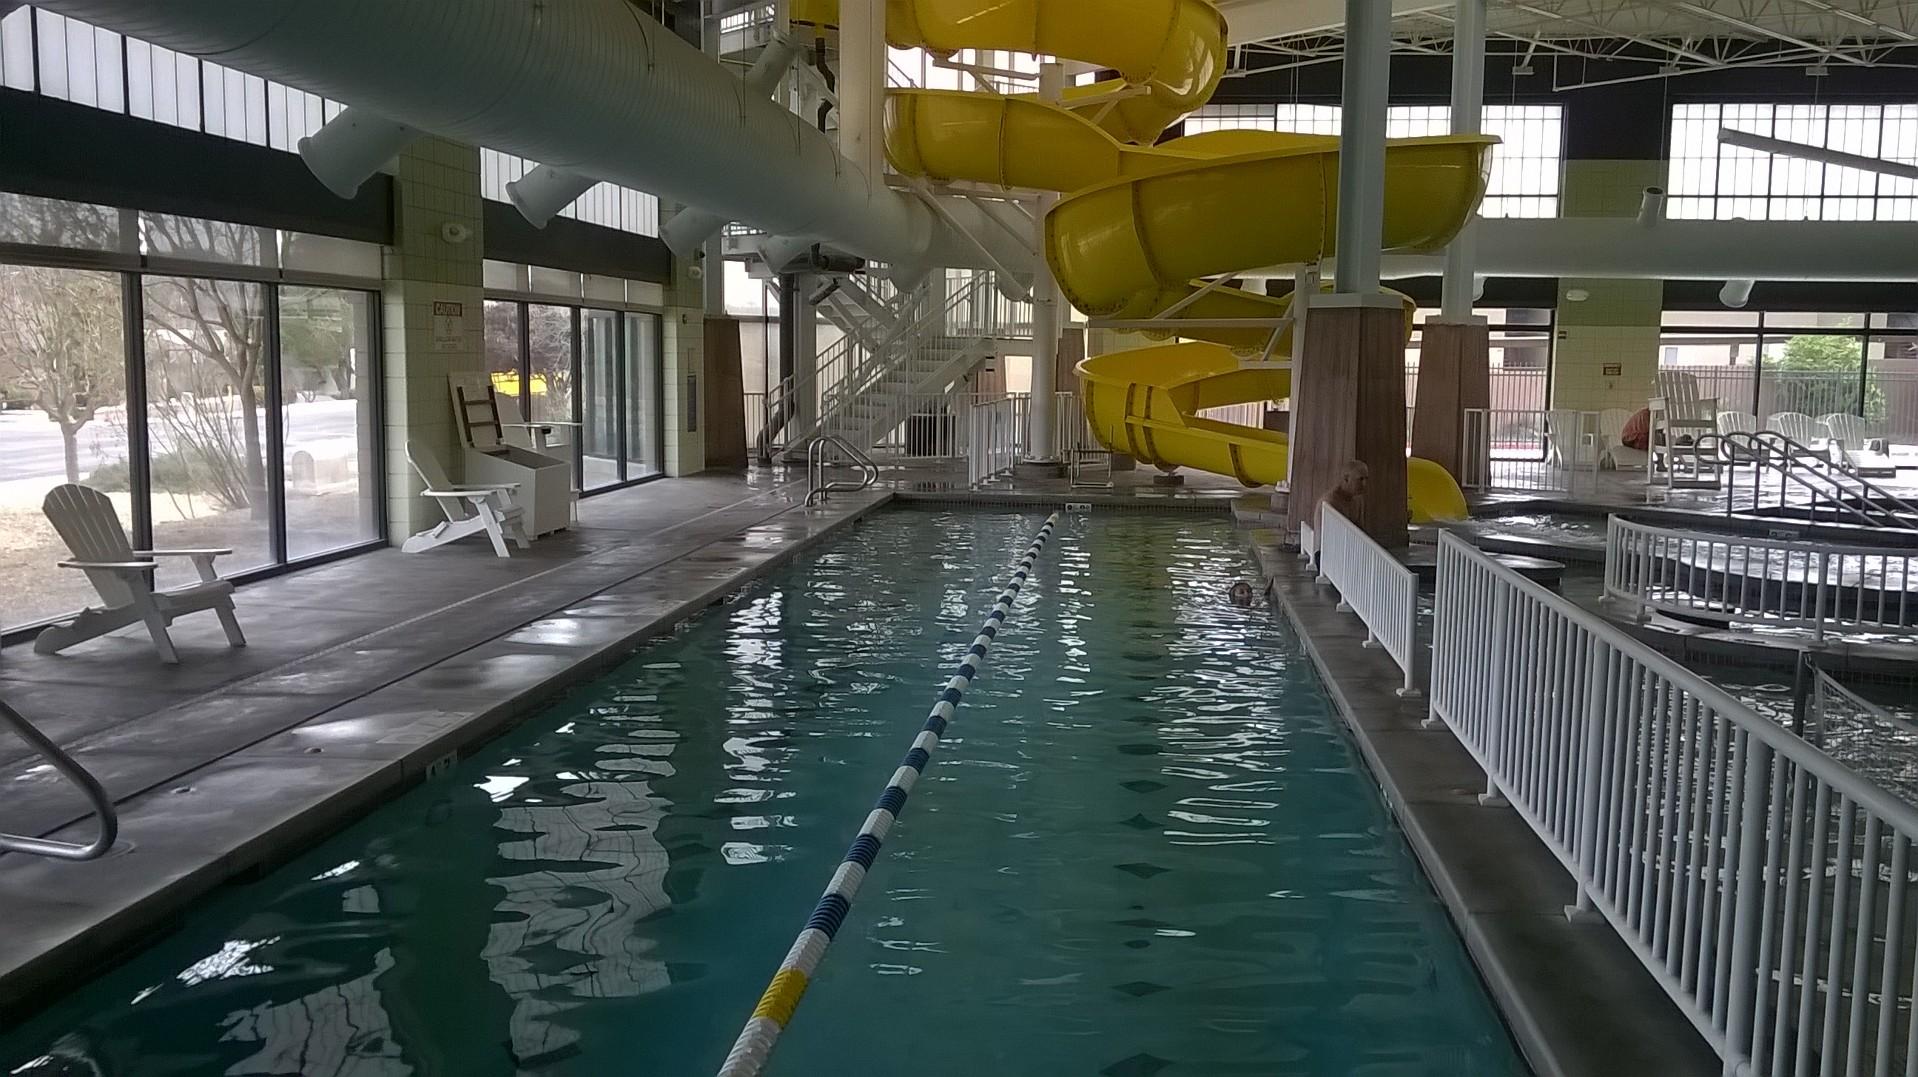 0231 - Cottonwood Rec Center - Indoor Pool - AZ